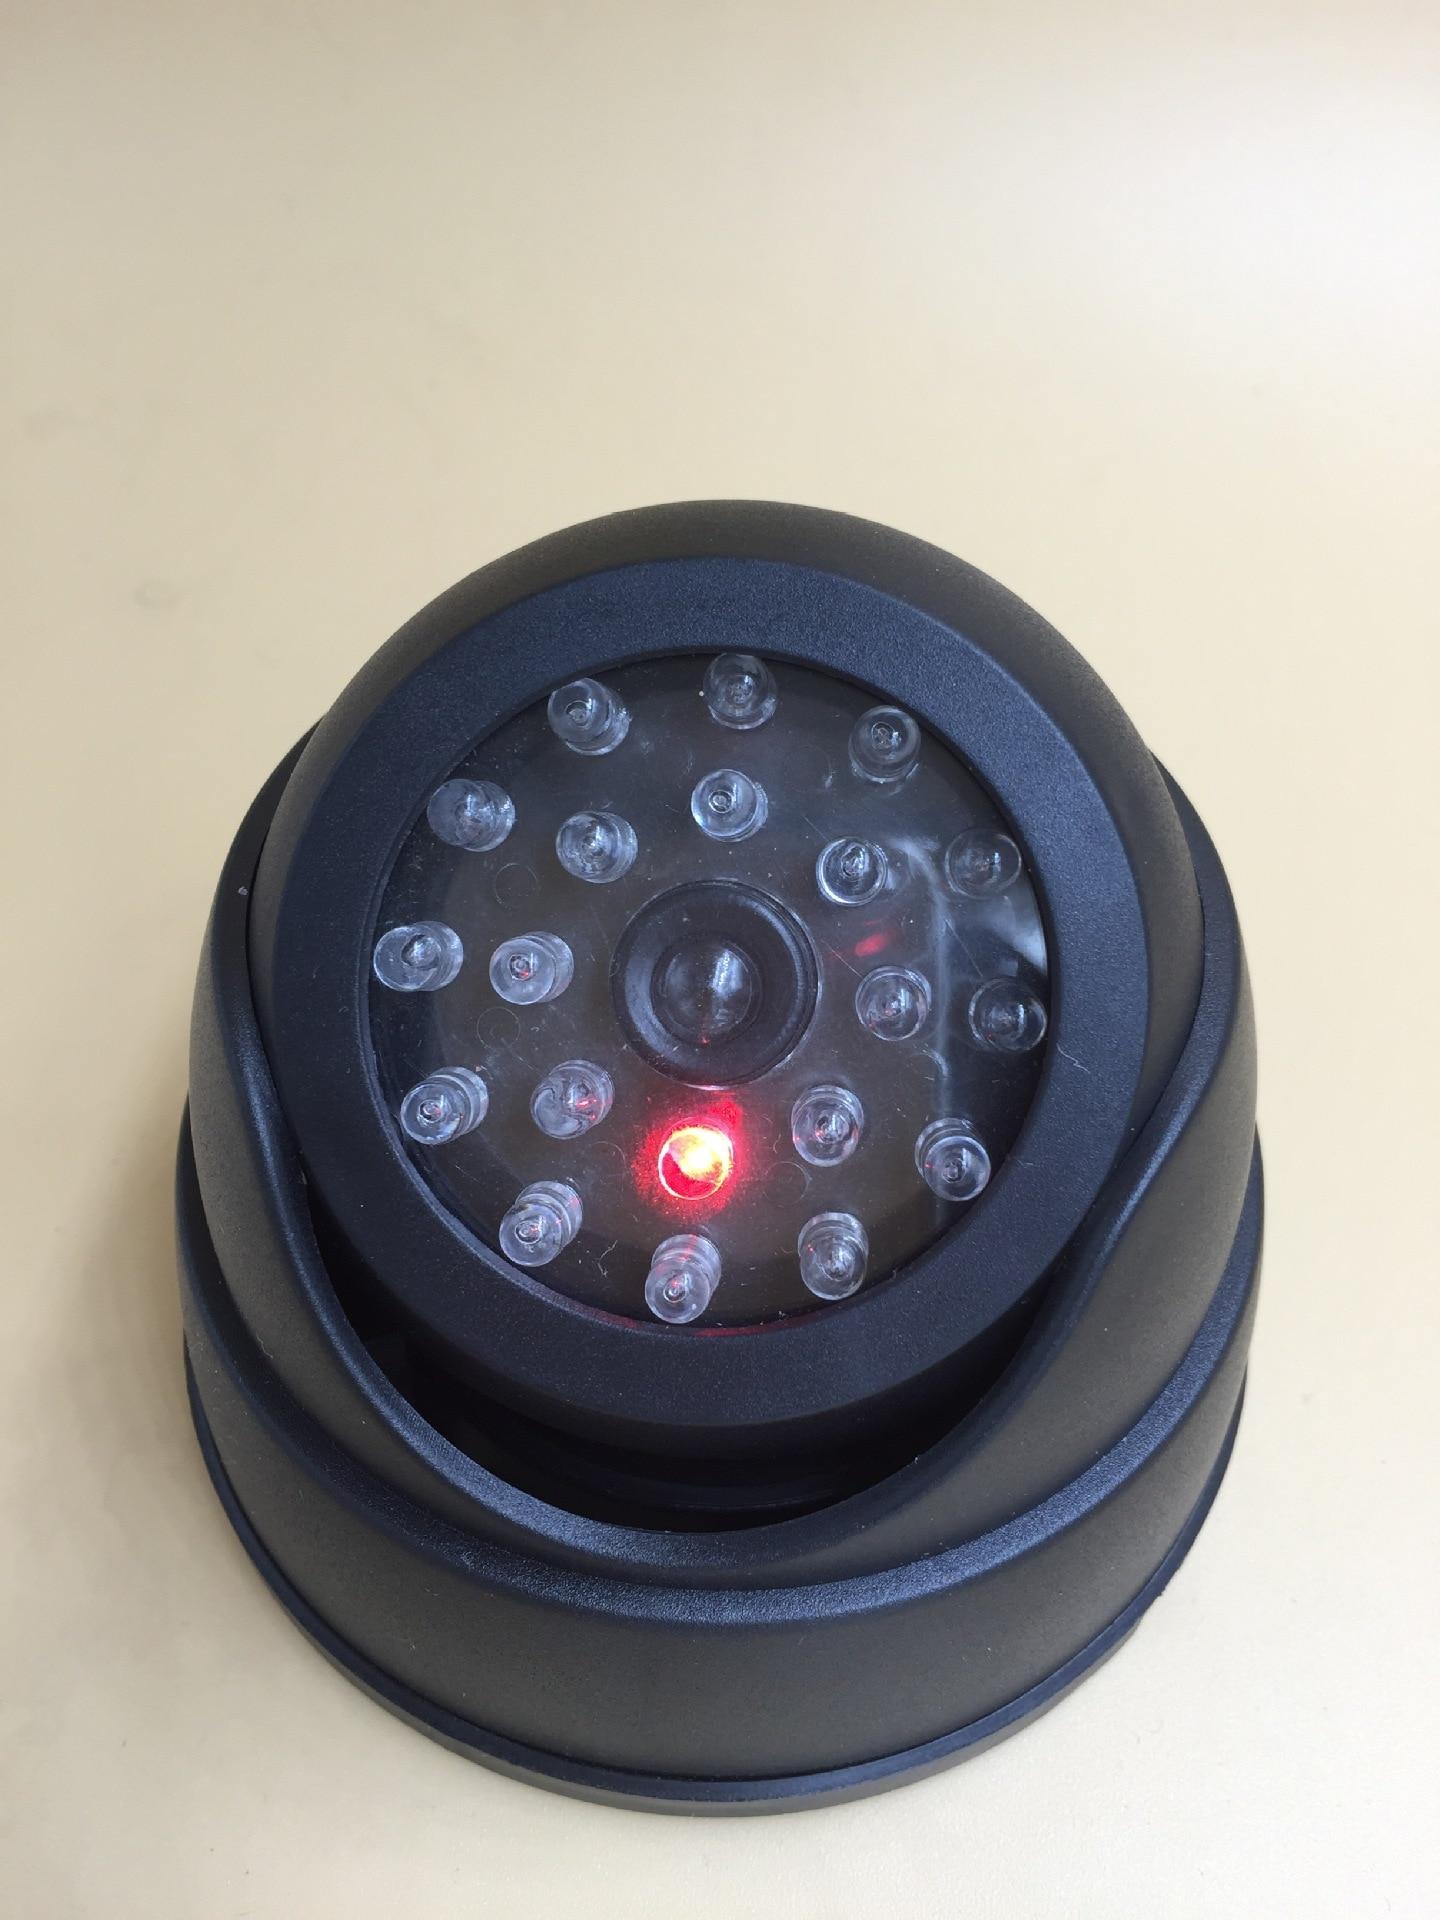 Aliexpress - dummy dome surveillance security camera